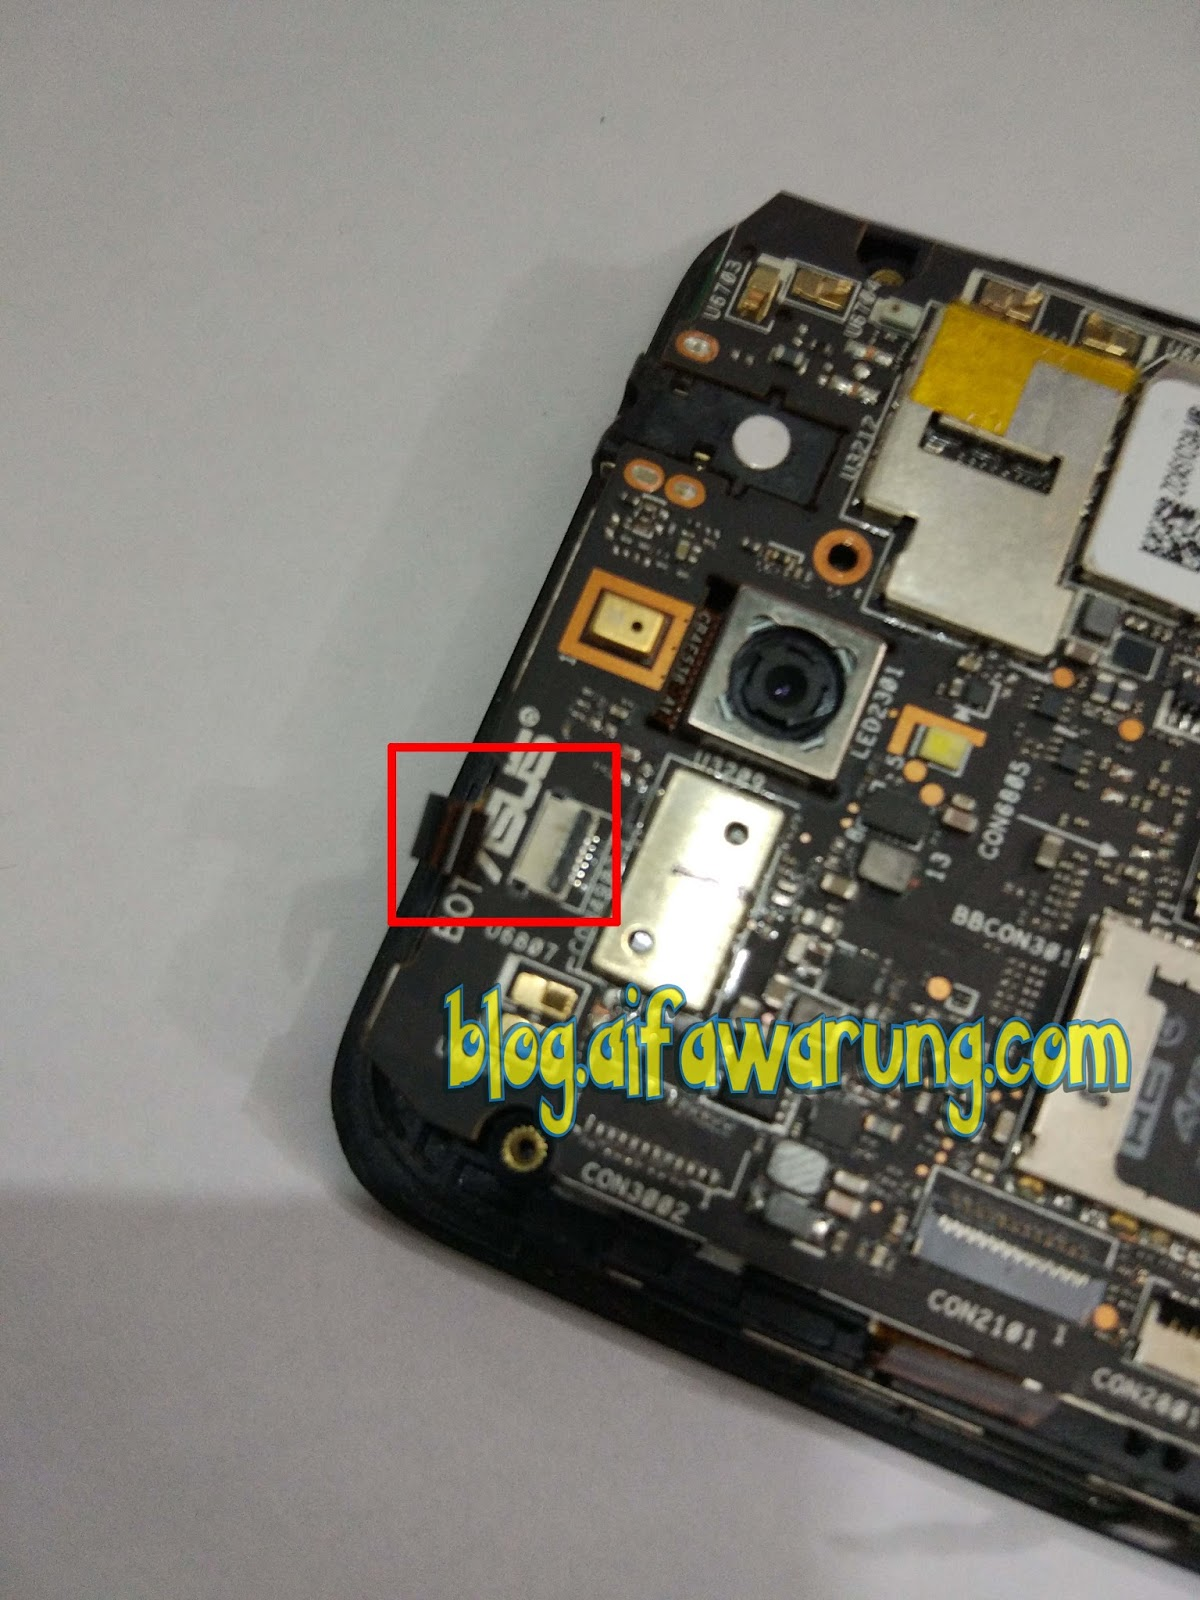 Cara Ganti Lcd  Led   Kaca Layar Sentuh Asus Zenfone C  Z007